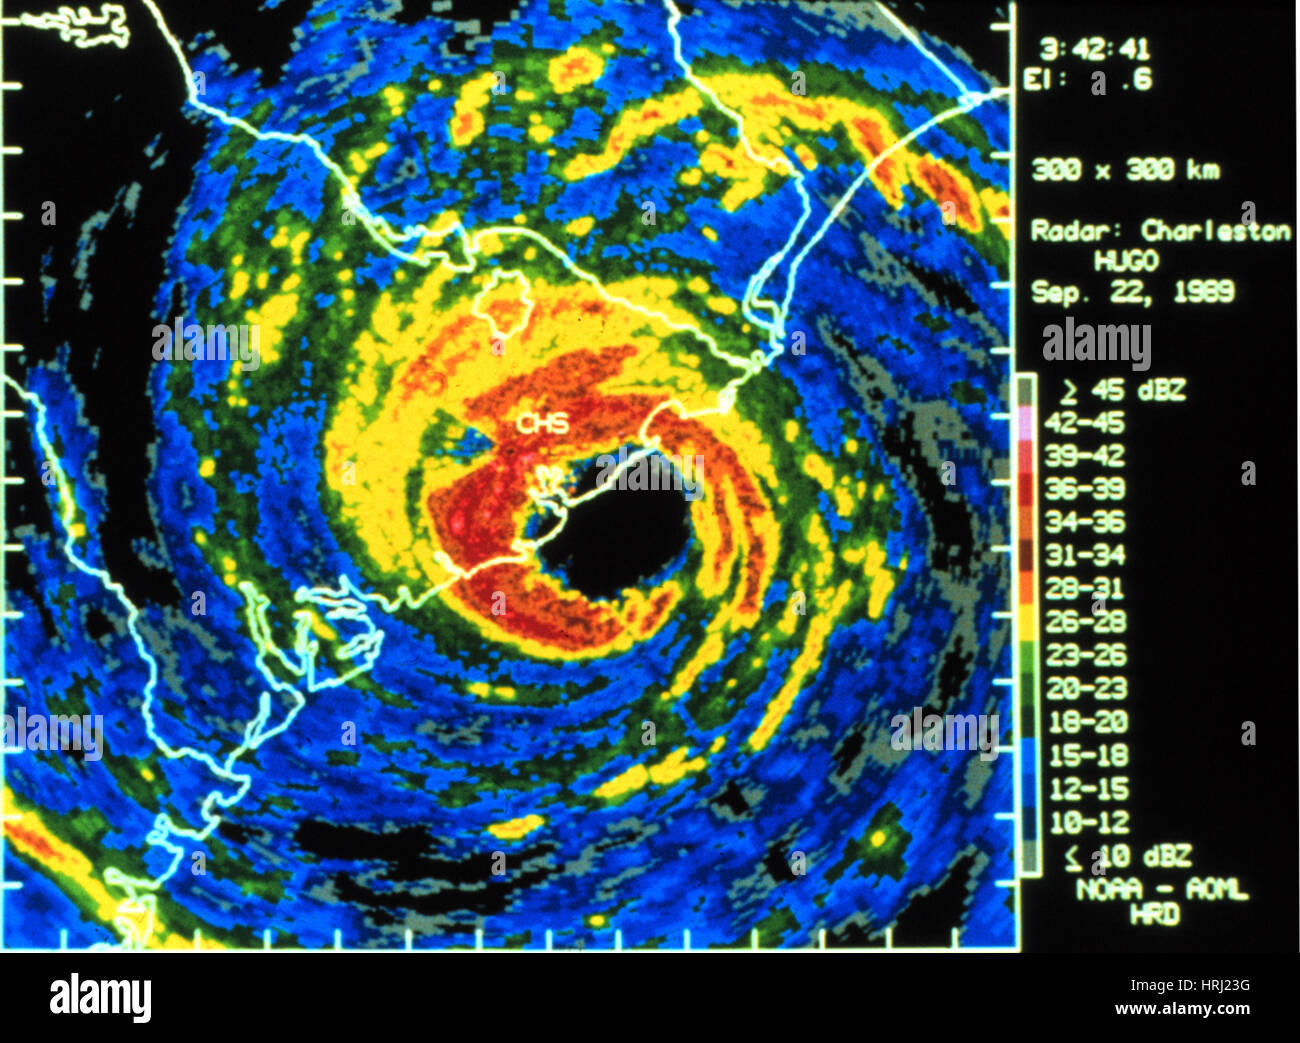 Hurrikan Hugo, digitalisiert Radarbild, 1989 Stockbild